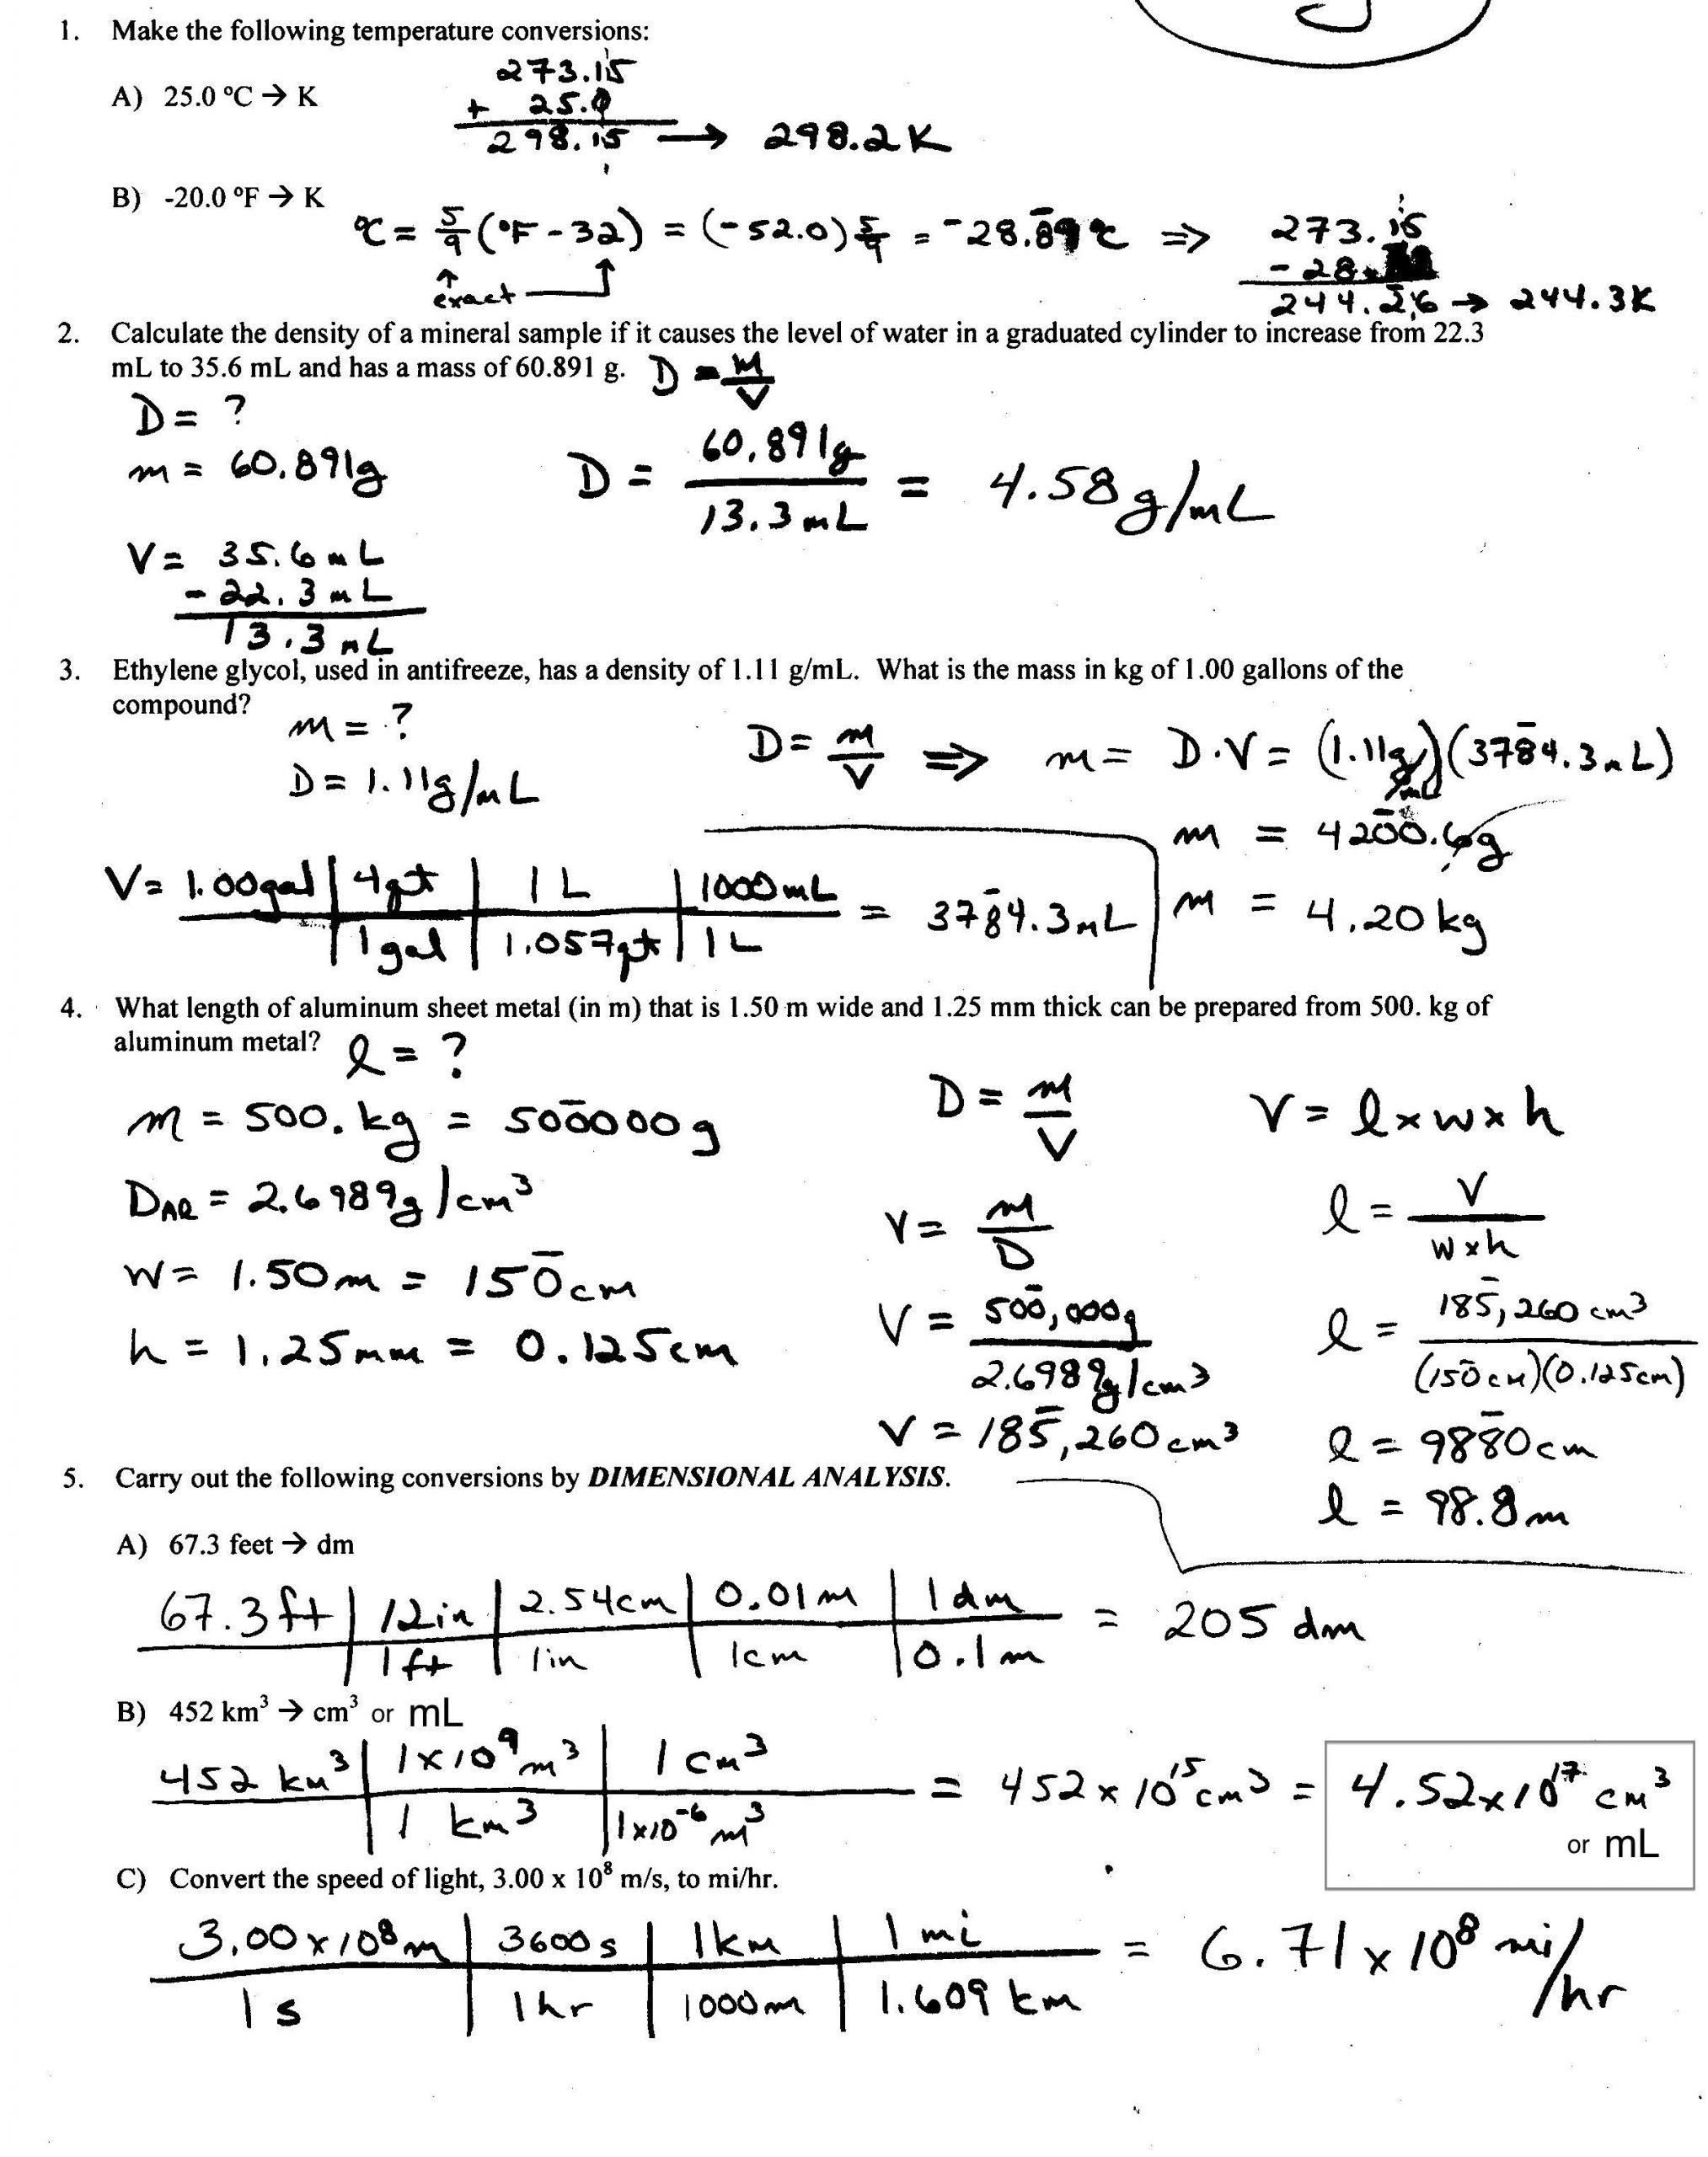 Dimensional Analysis Worksheet Chemistry Density Worksheet with Answers Calculate Density Worksheet